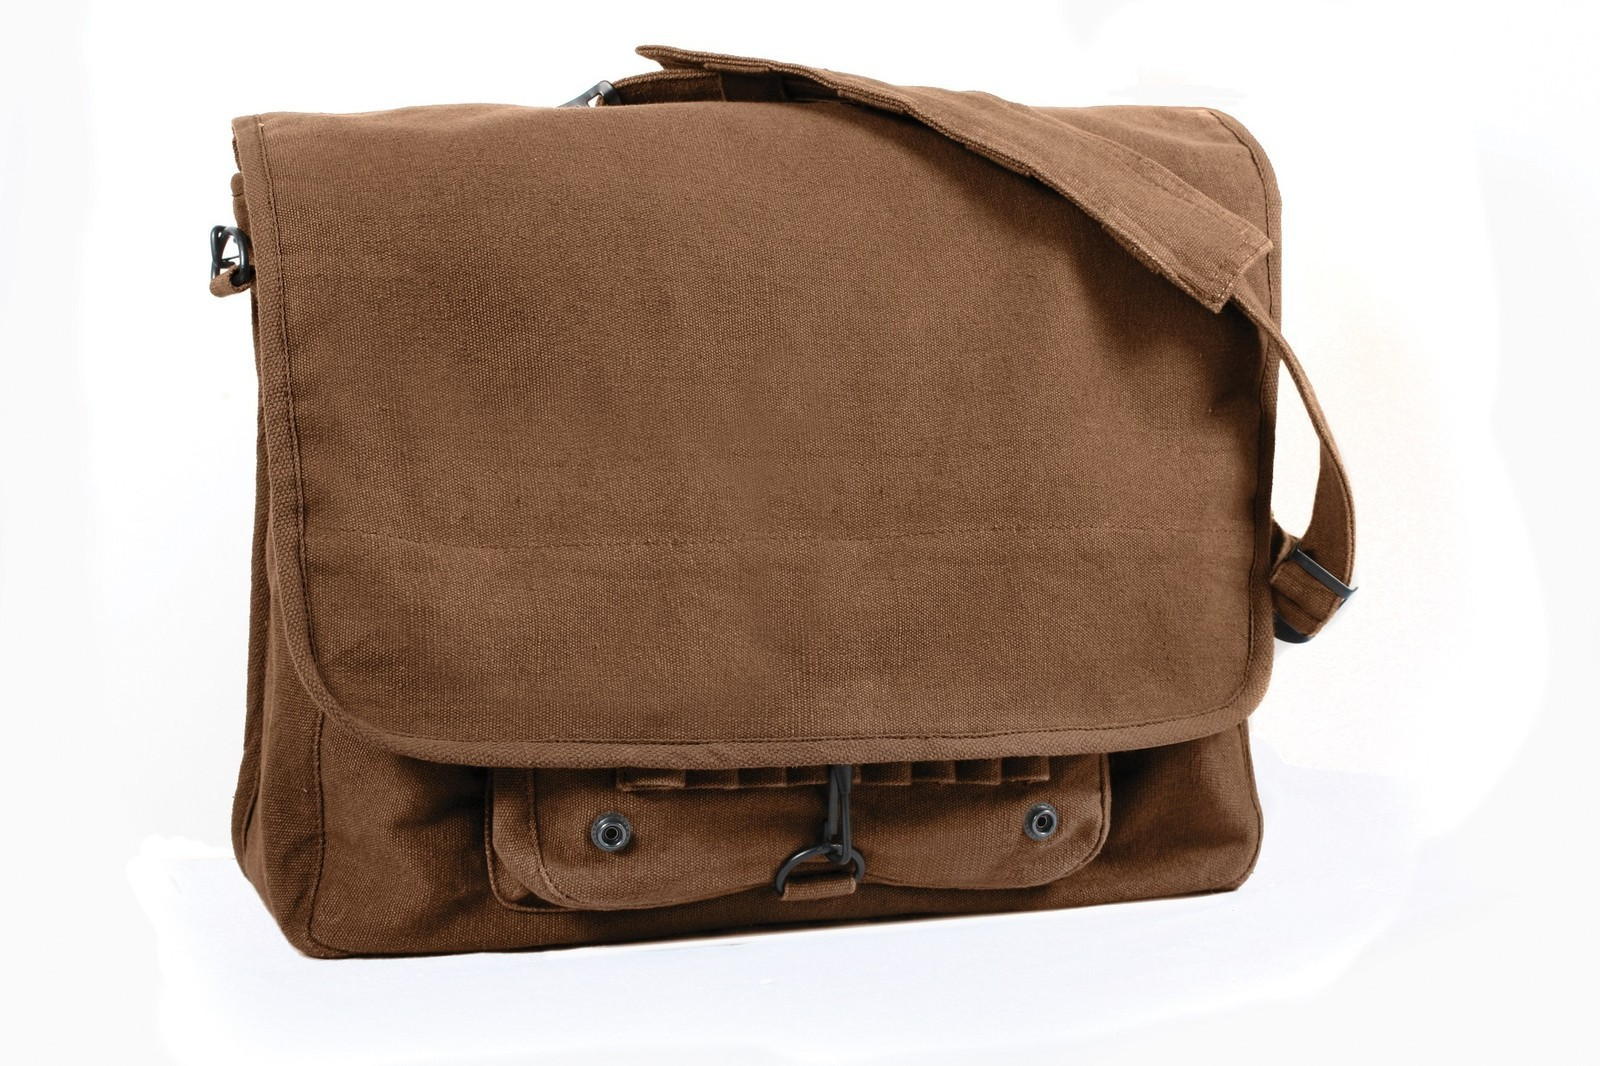 91455b9c3d Lunar Scooter Vintage Canvas Shoulder Bags Messenger Bags